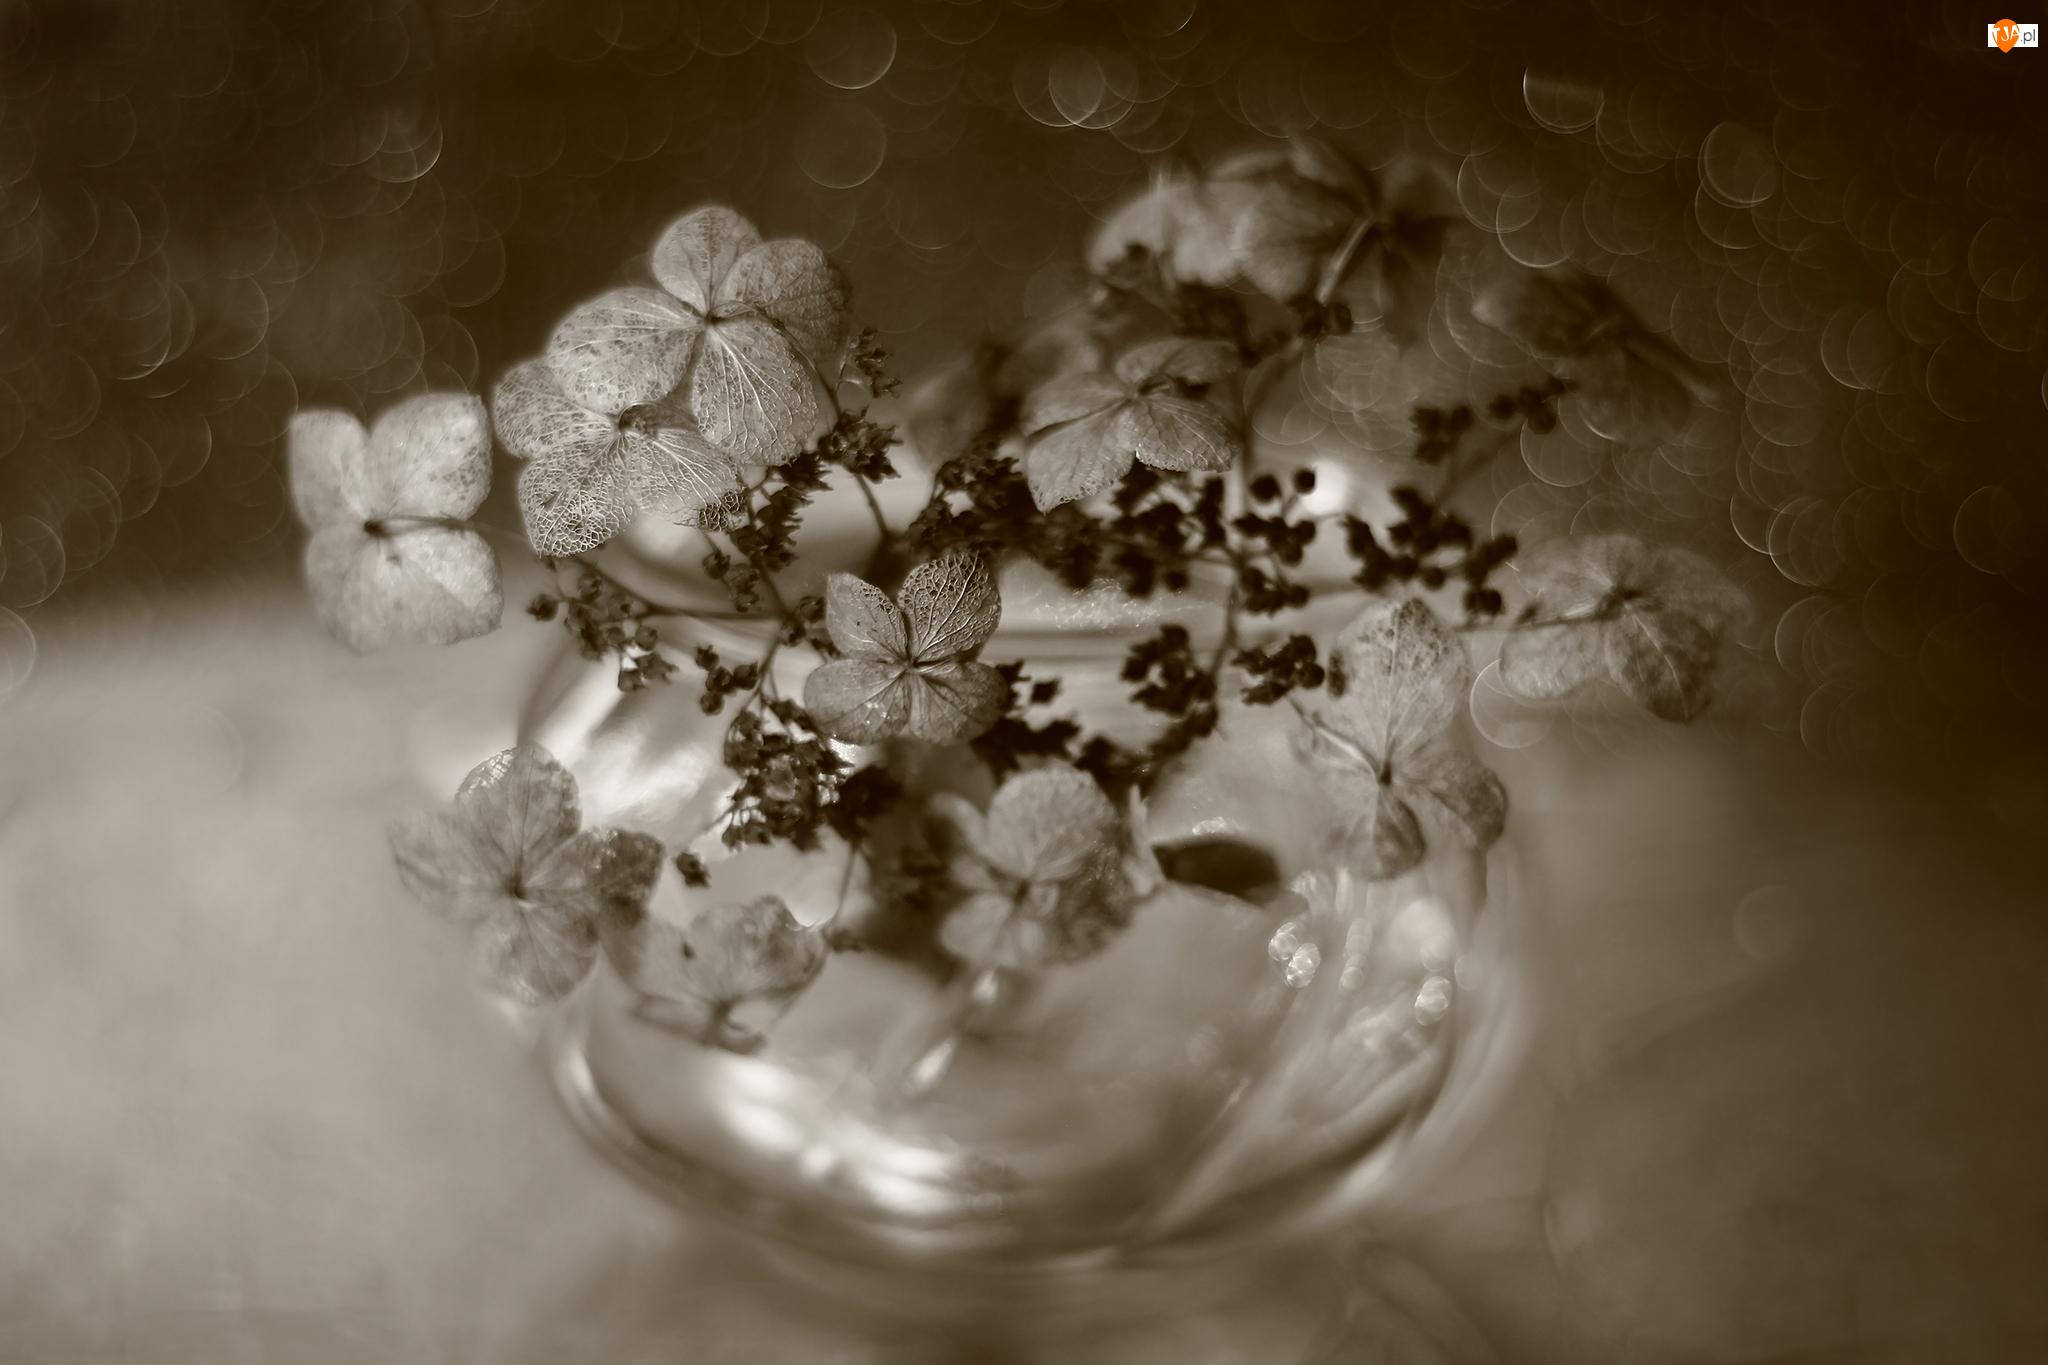 Kwiaty, Bokech, Hortensja, Sepia, Suche, Wazonik